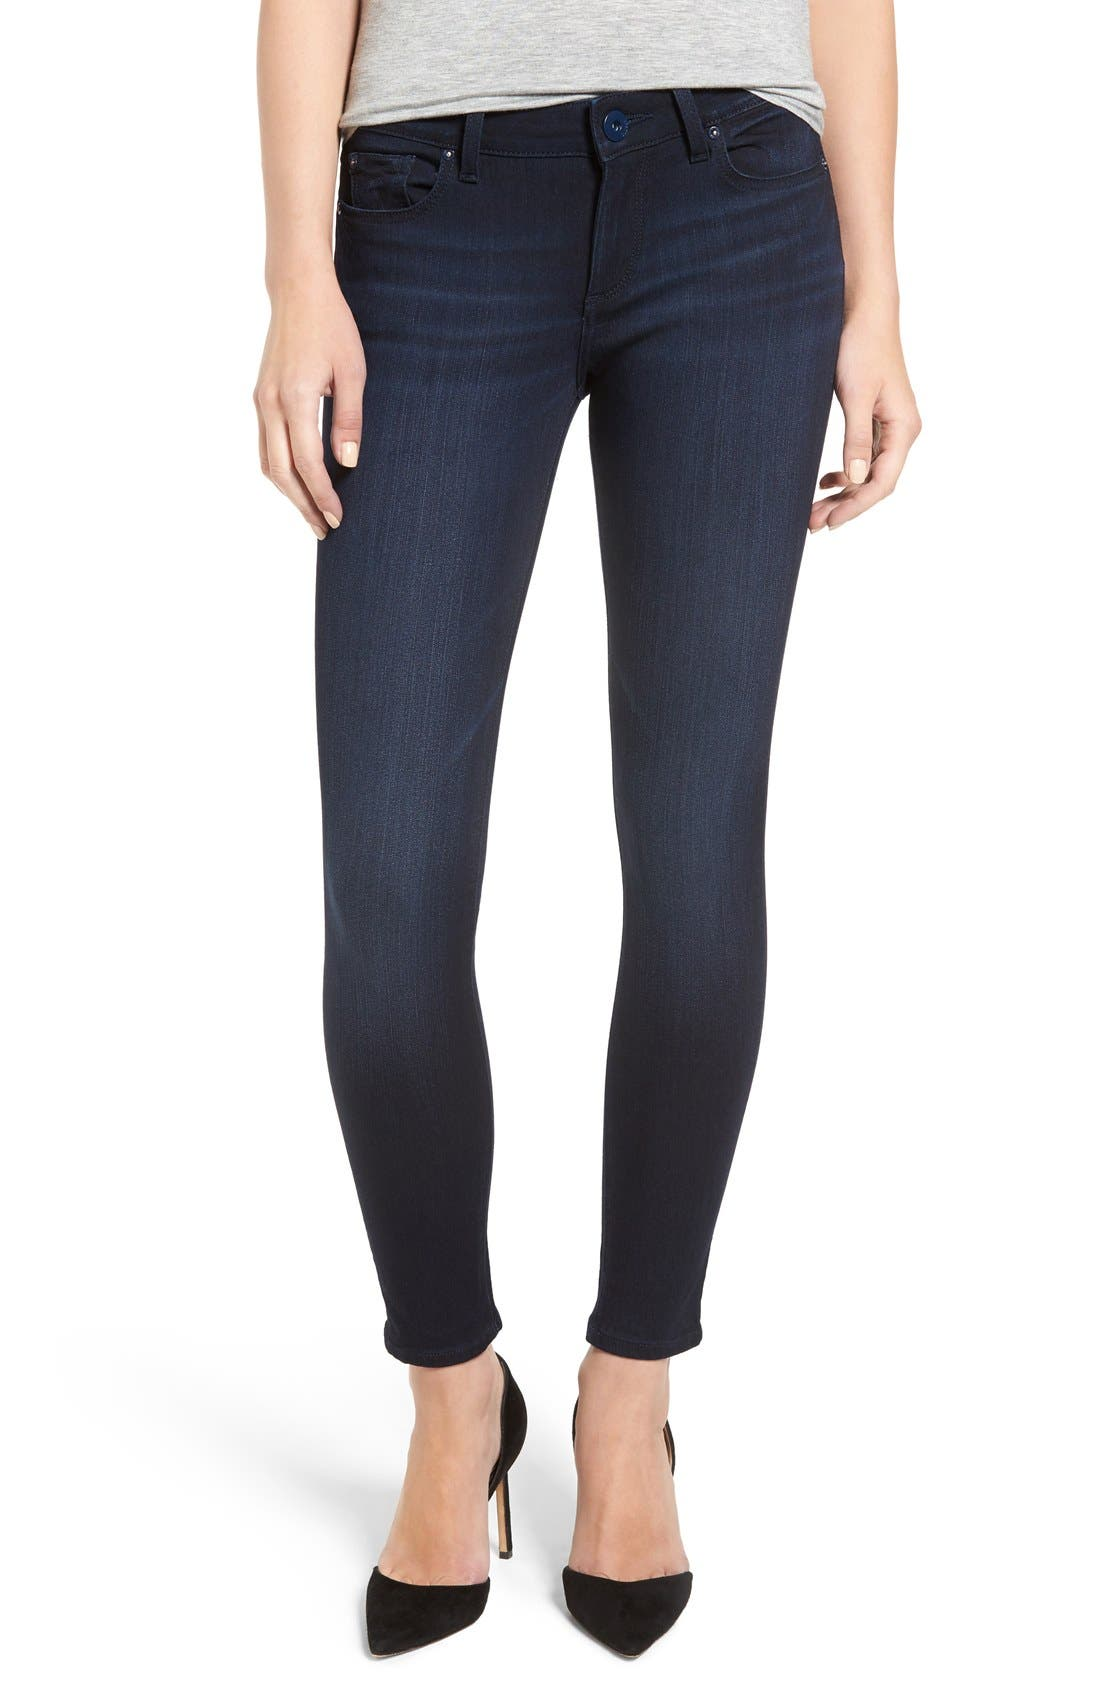 'Emma' Power Legging Jeans,                         Main,                         color, 405